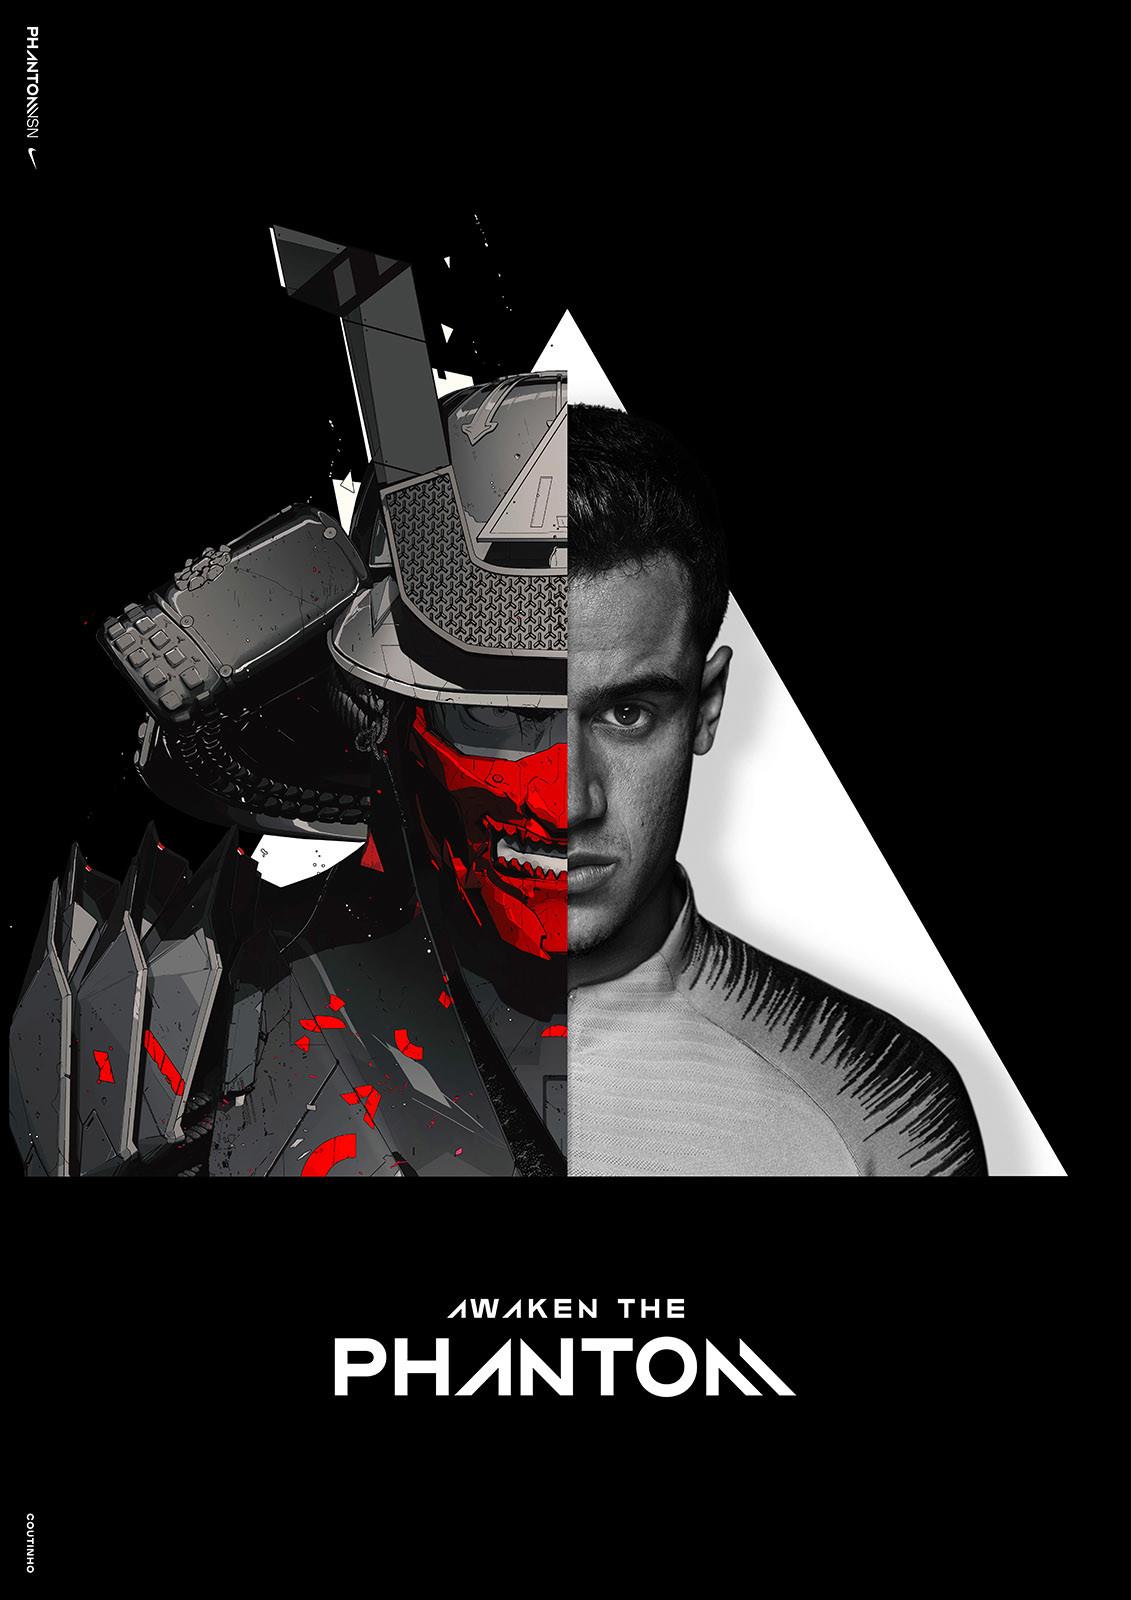 Maciej kuciara fa18 gx coutinho alter ego phantom posters warrior 01